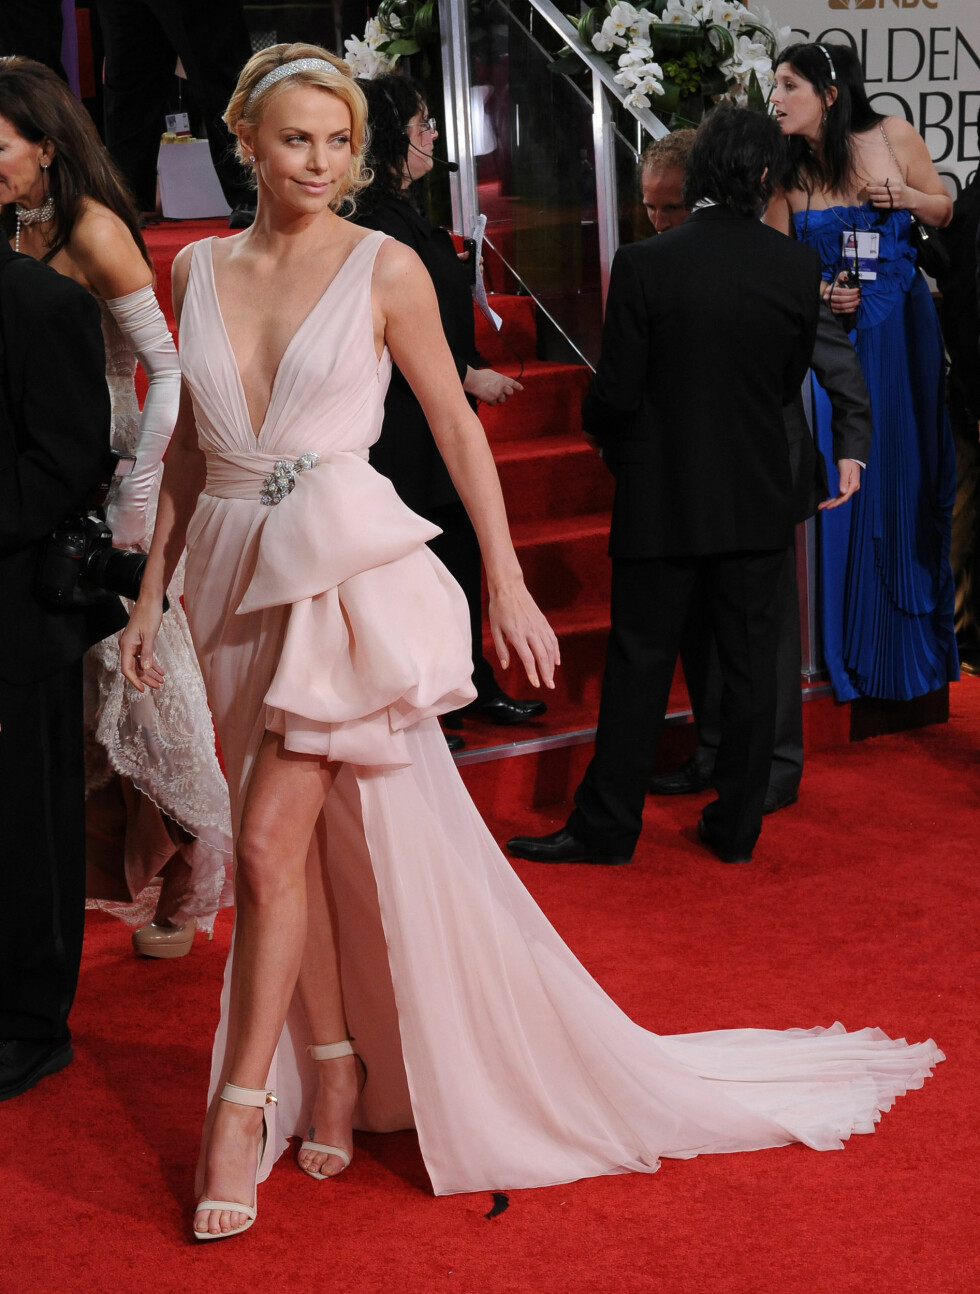 SØT I DIOR: Skuespiller Charlize Theron valgte en pudderrosa kjole fra Dior med dristig splitt opp til låret.  Foto: Fame Flynet Norway